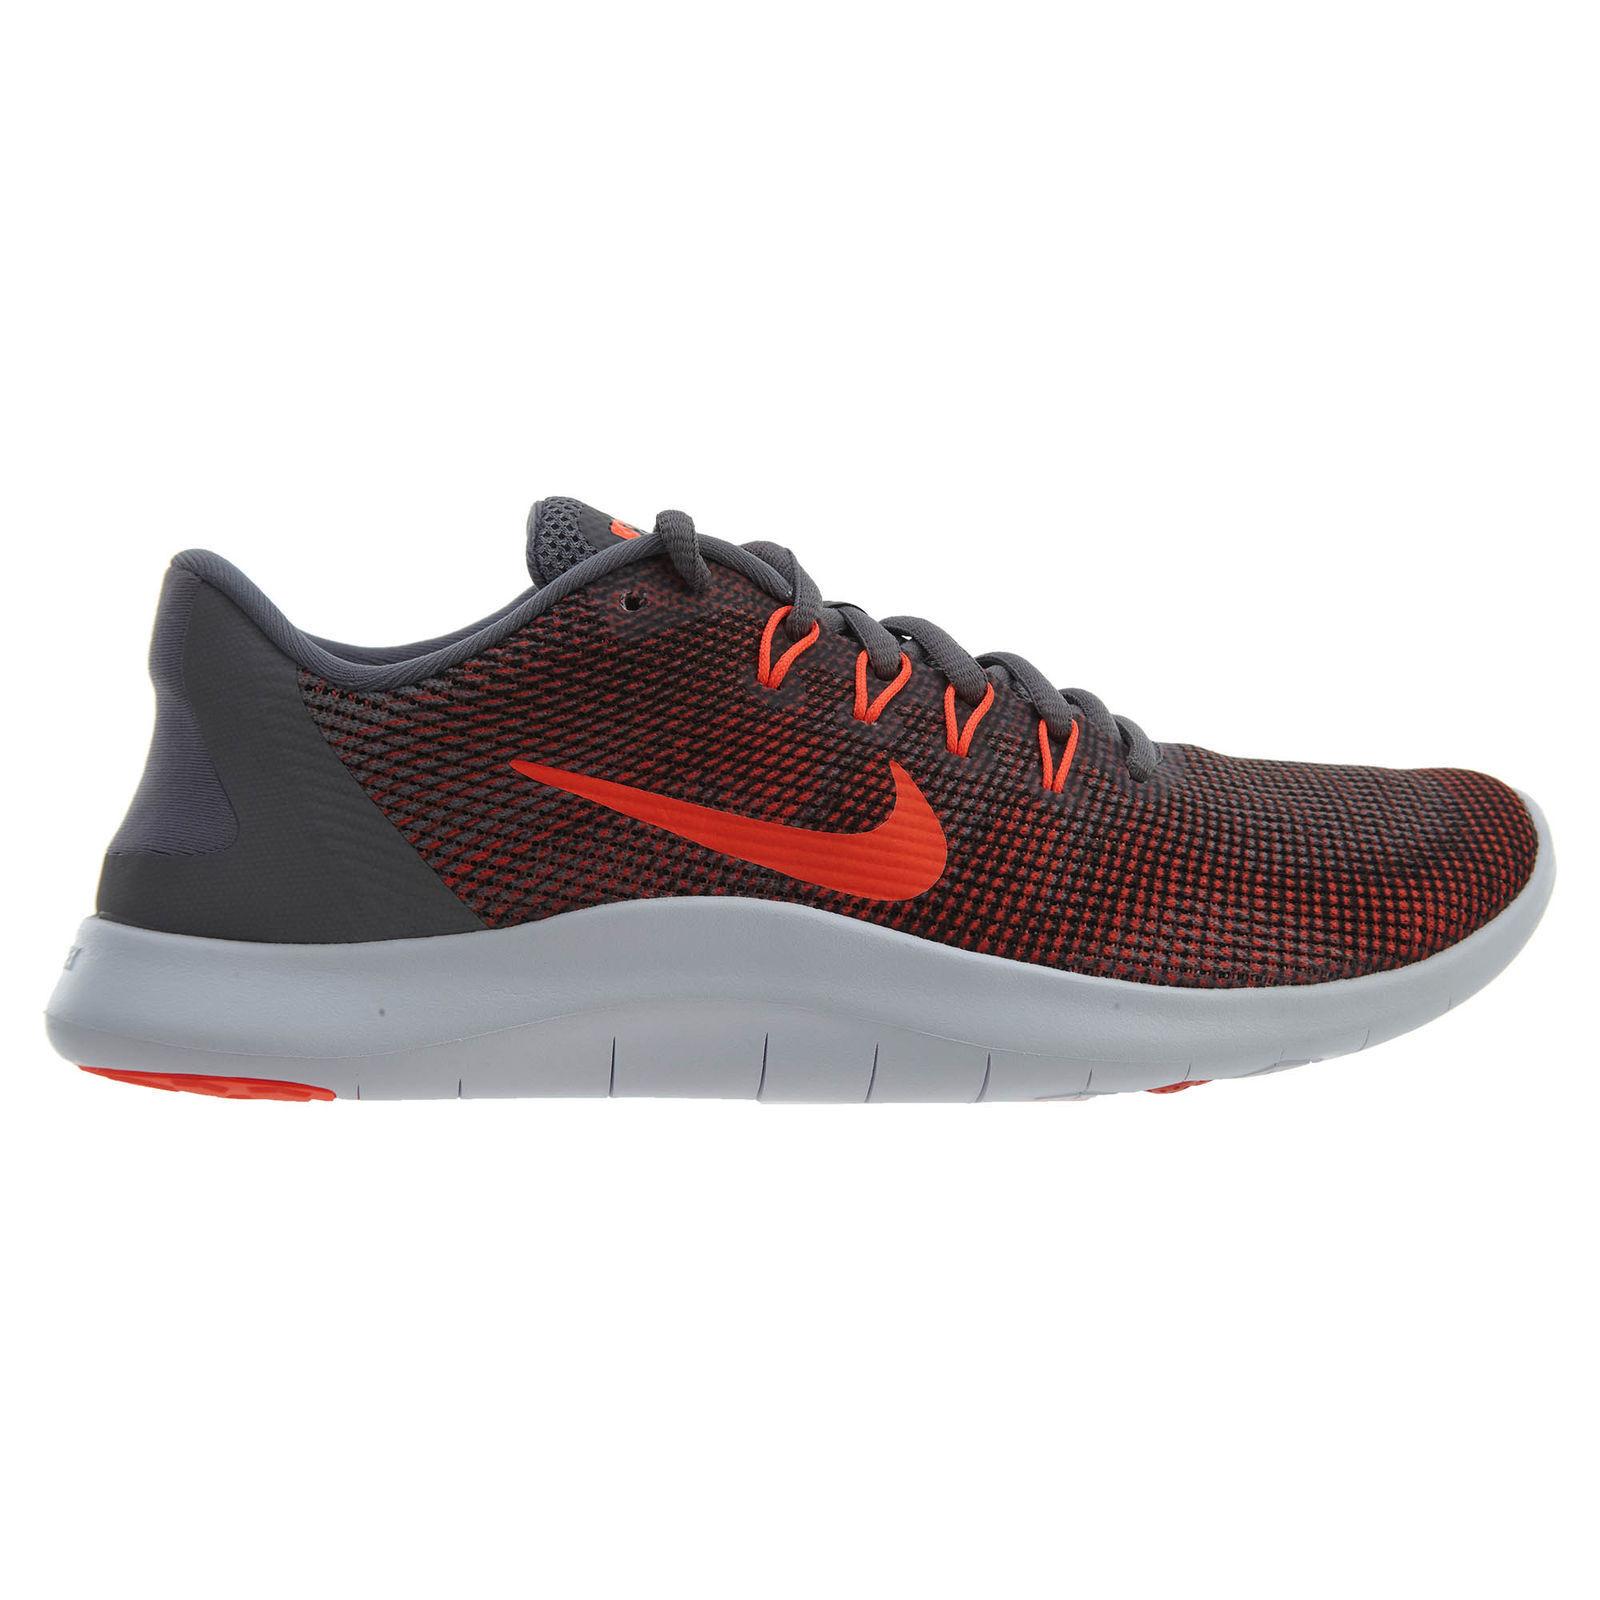 832b41c458628 Nike Flex 2018 RN Mens AA7397-006 Gunsmoke Grey Crimson Running Running  Running shoes Size